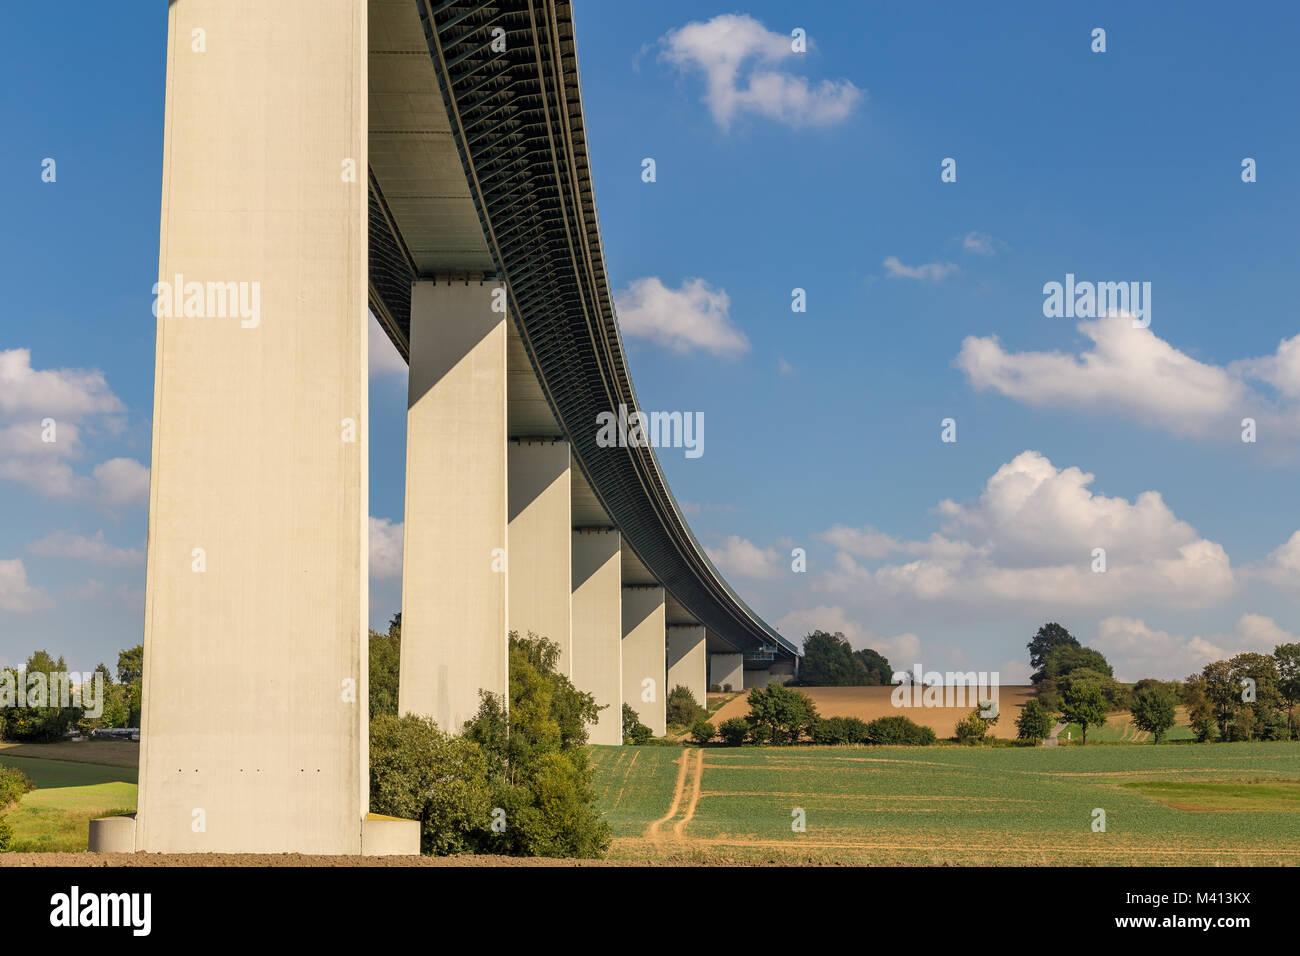 Ruhrtalbruecke (Ruhr Valley viaduct) near Muelheim, Ruhr Area, North Rhine-Westphalia, Germany - Stock Image